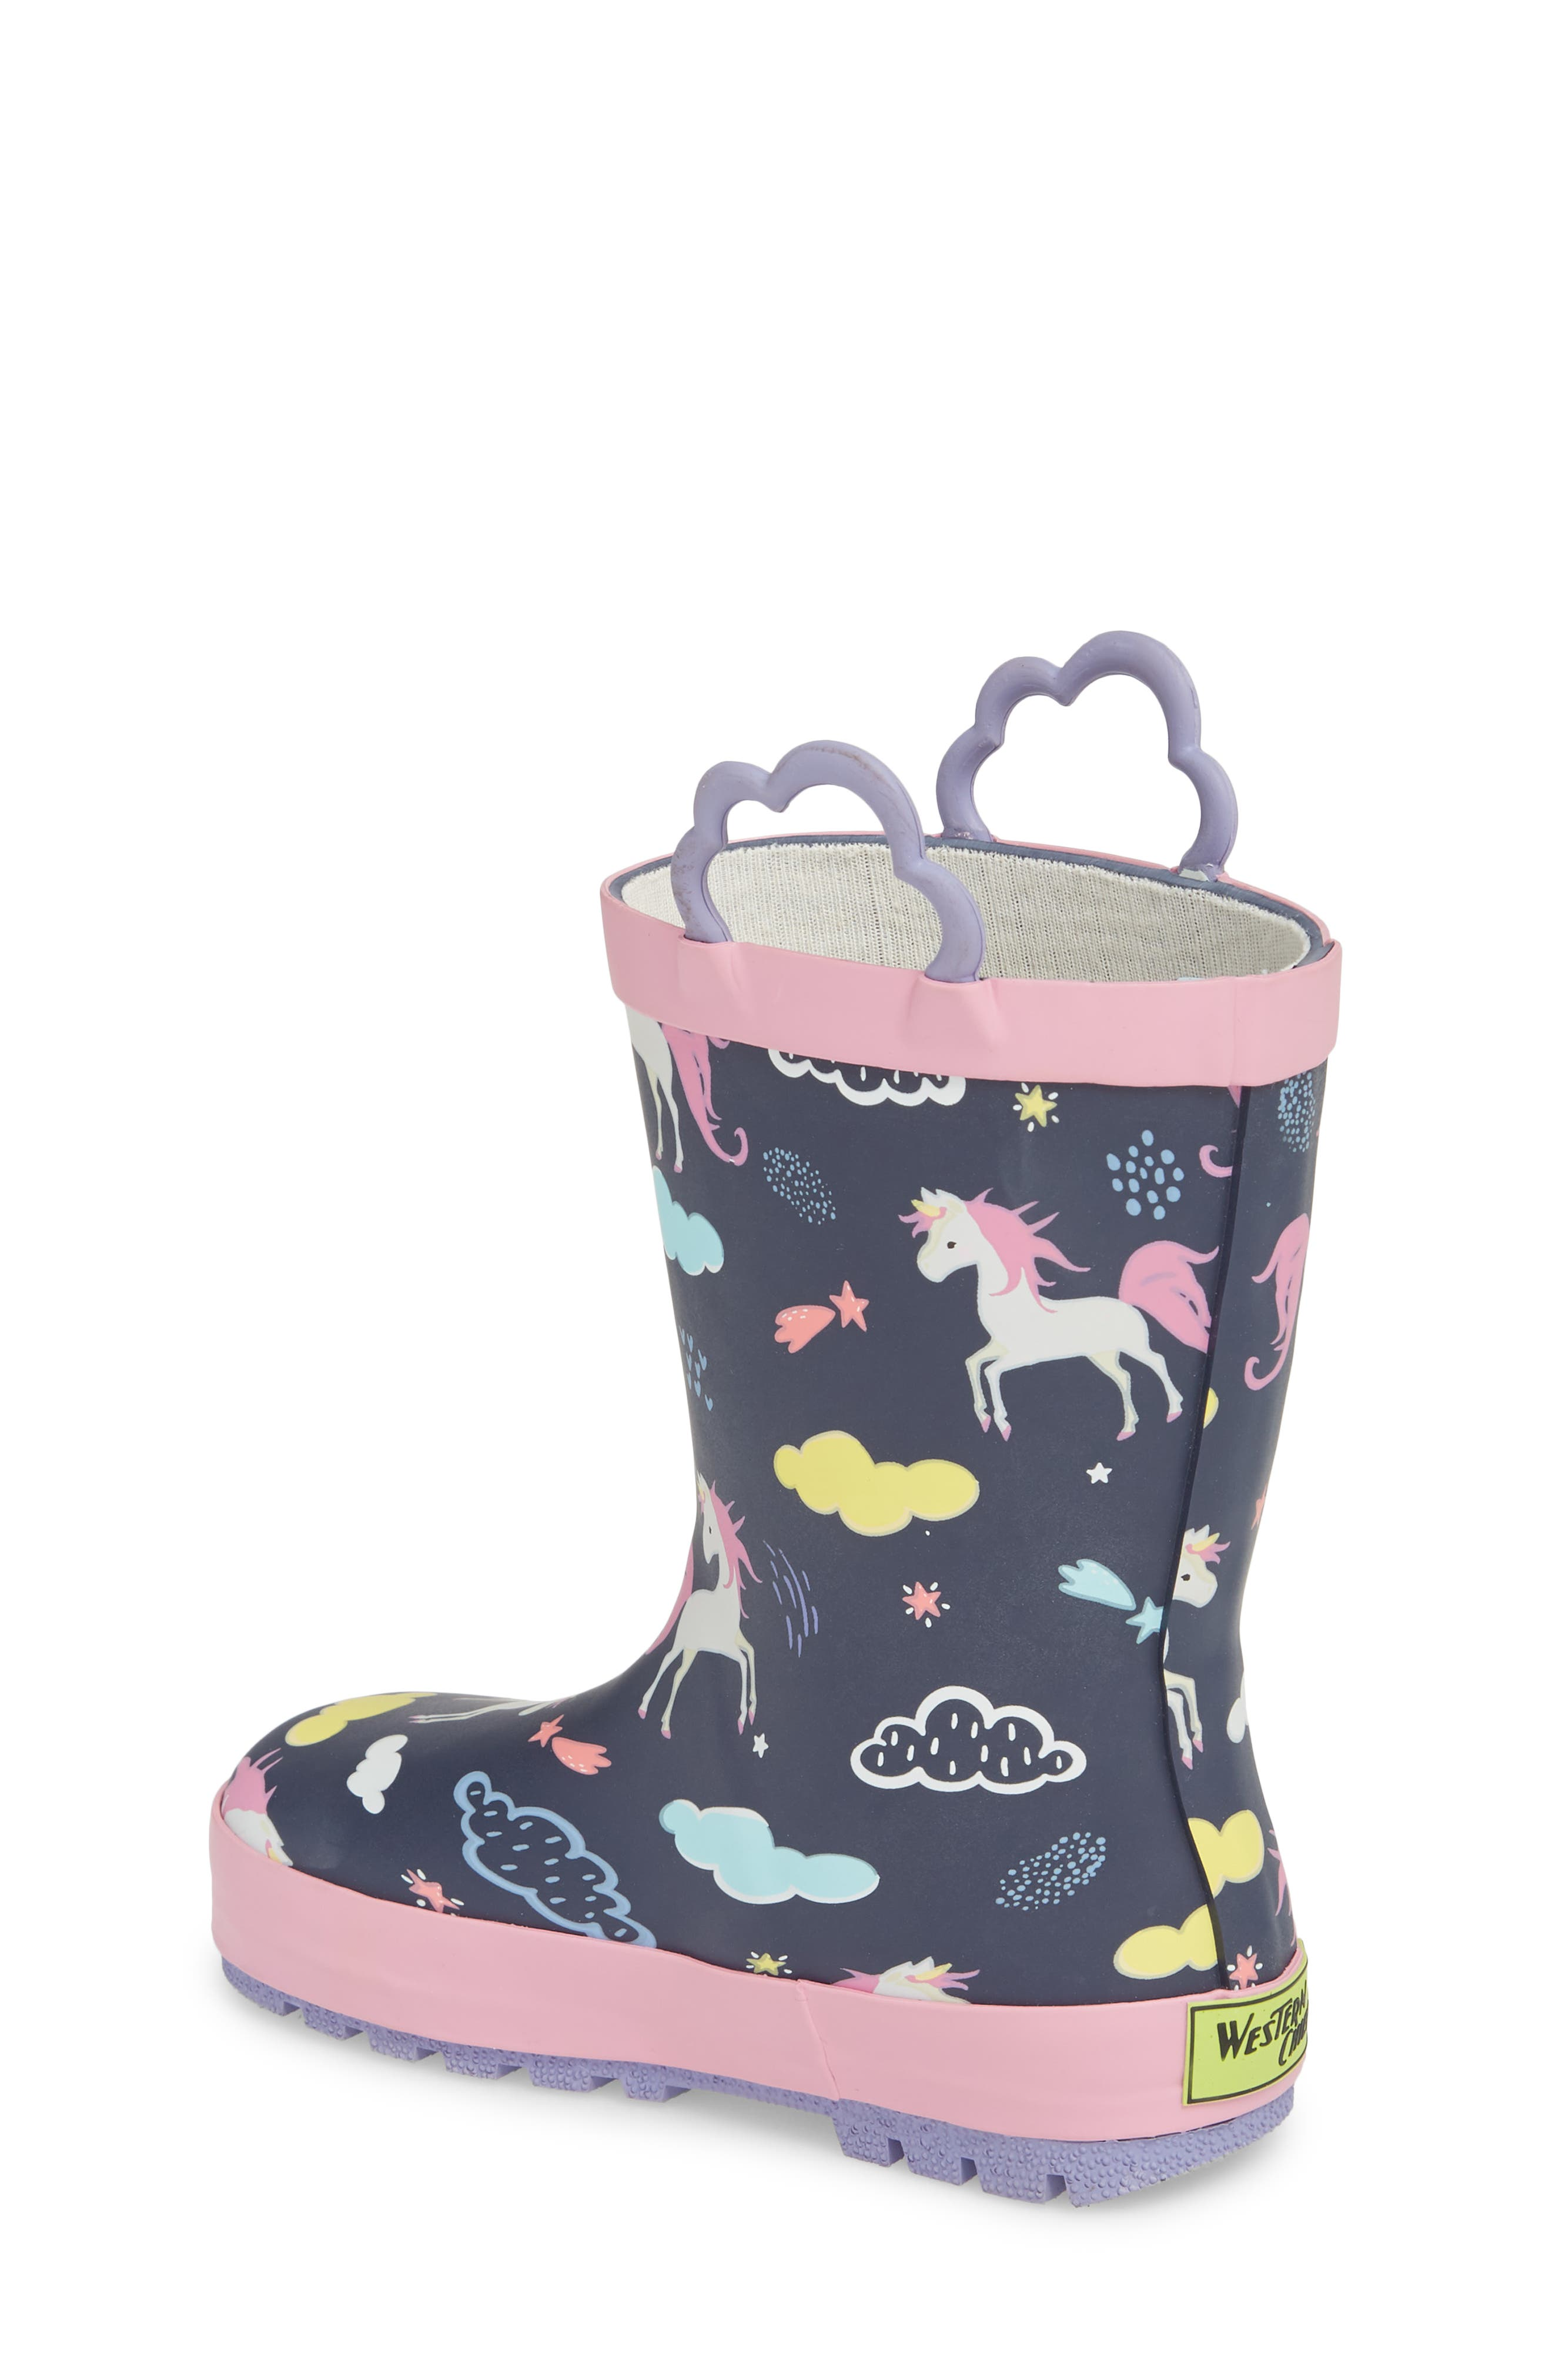 Unicorn Play Waterproof Rain Boot,                             Alternate thumbnail 2, color,                             421